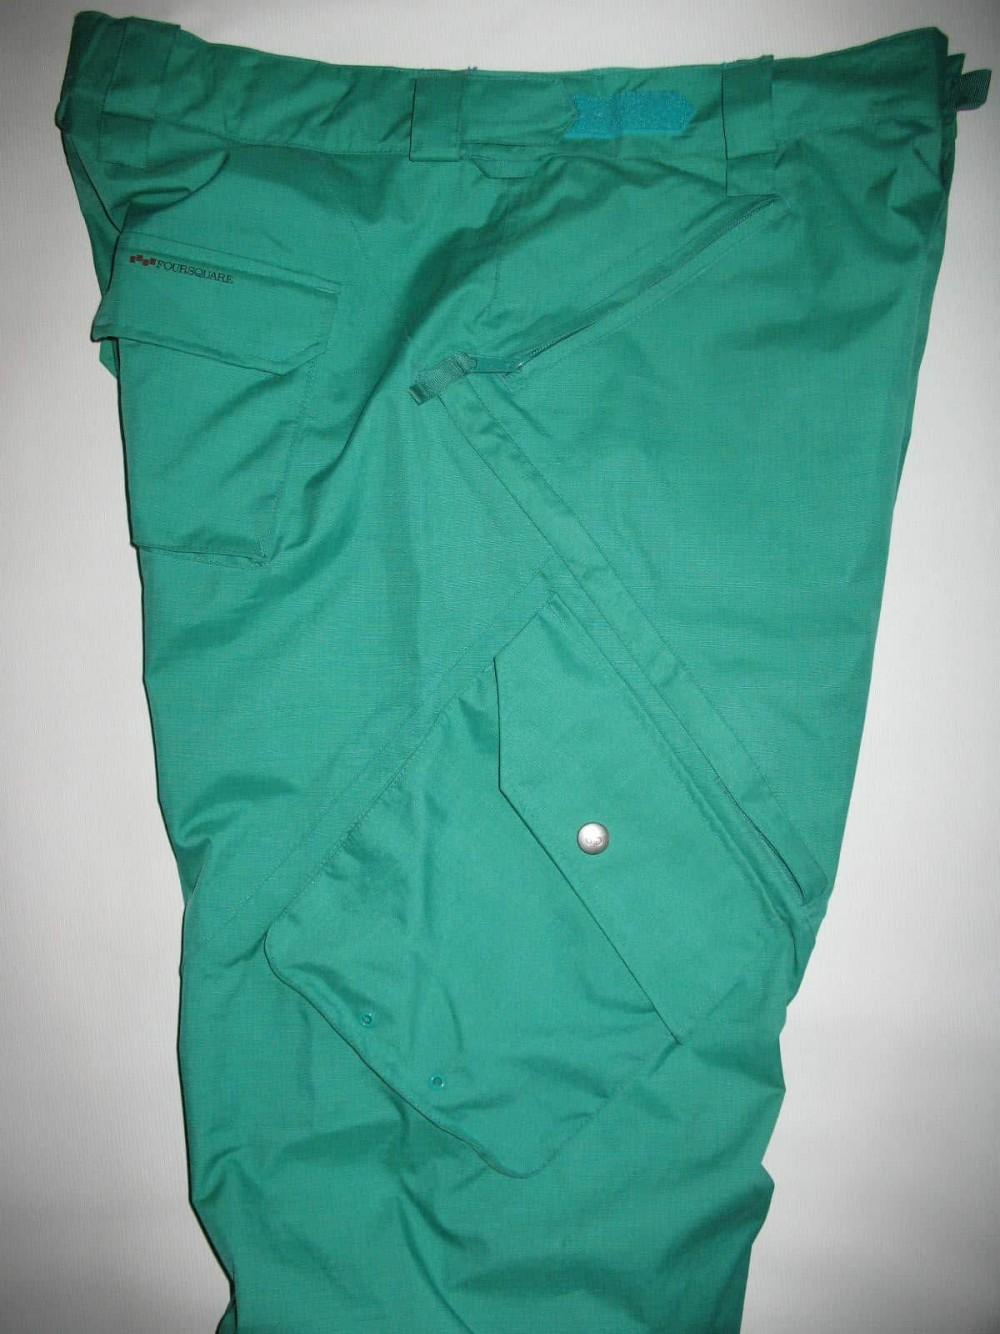 Штаны FOURSQUARE q snowboard pants (размер XL) - 5